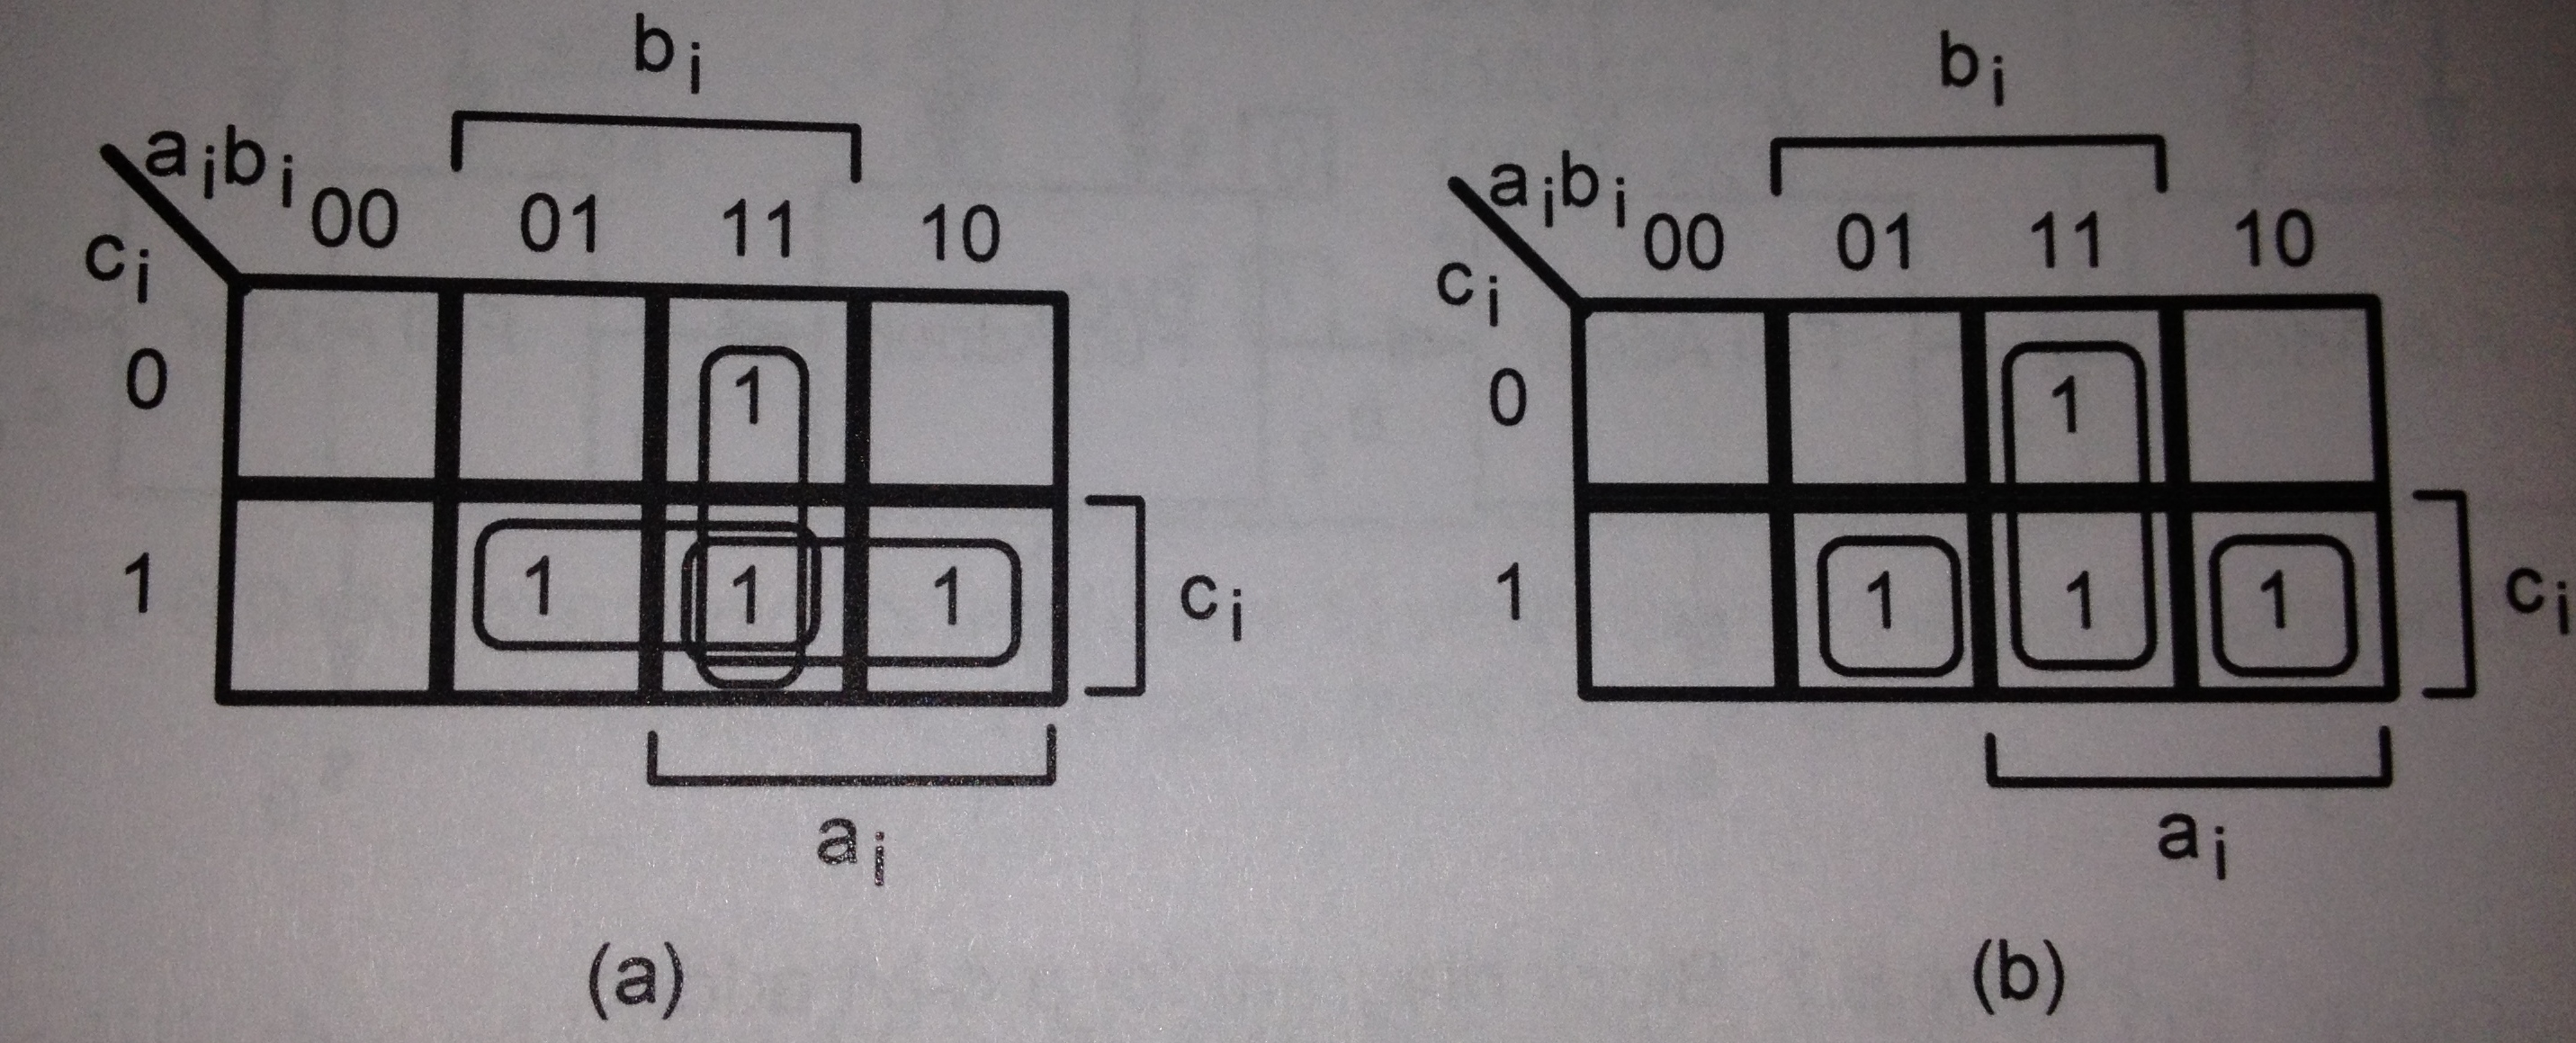 Bit Full Adder Circuit Half Subtractor Truth Table Bcd Adder Circuit